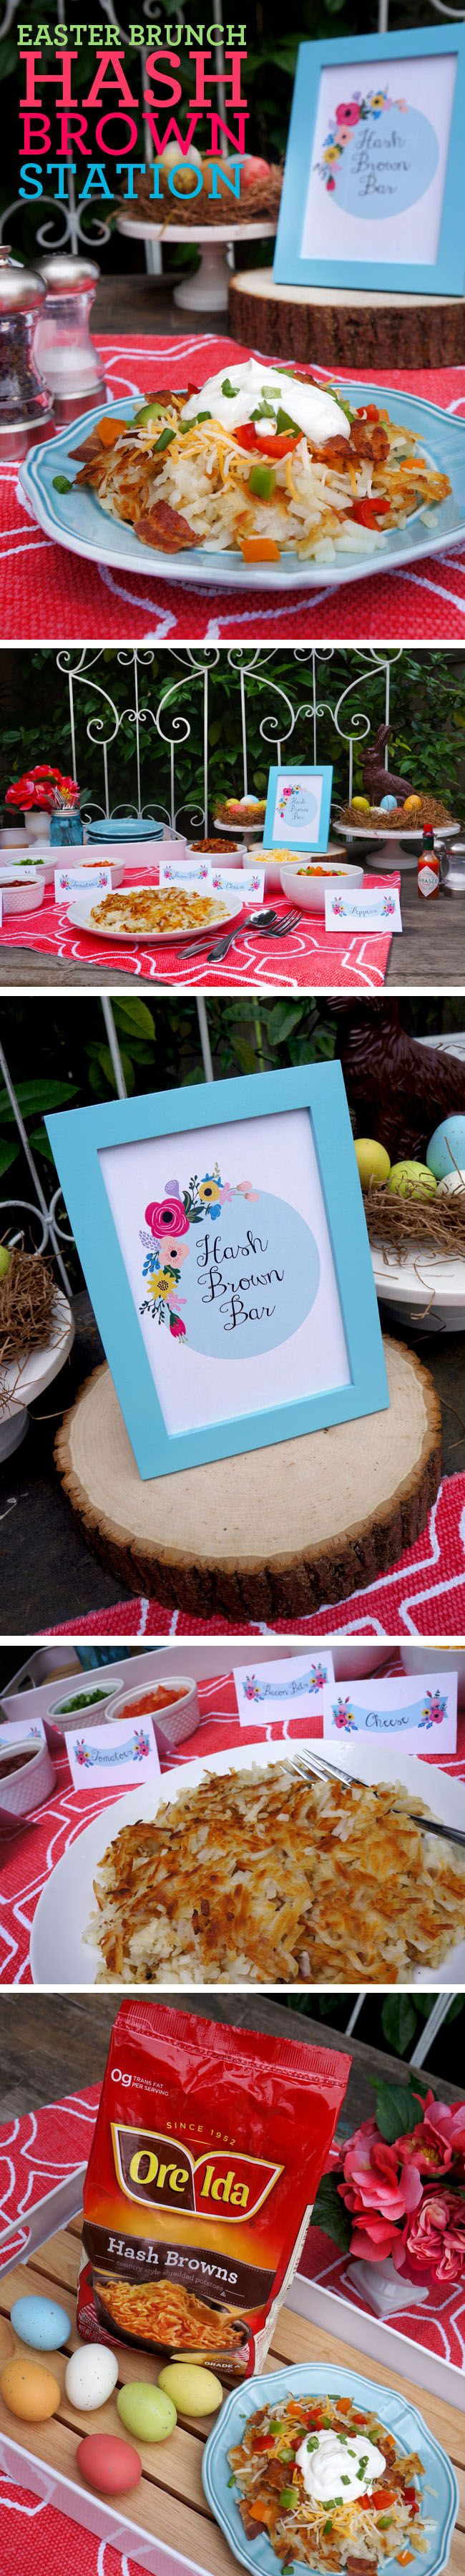 Hash Brown Station for Easter Brunch   Free printables  #easter #brunch #freeprintables